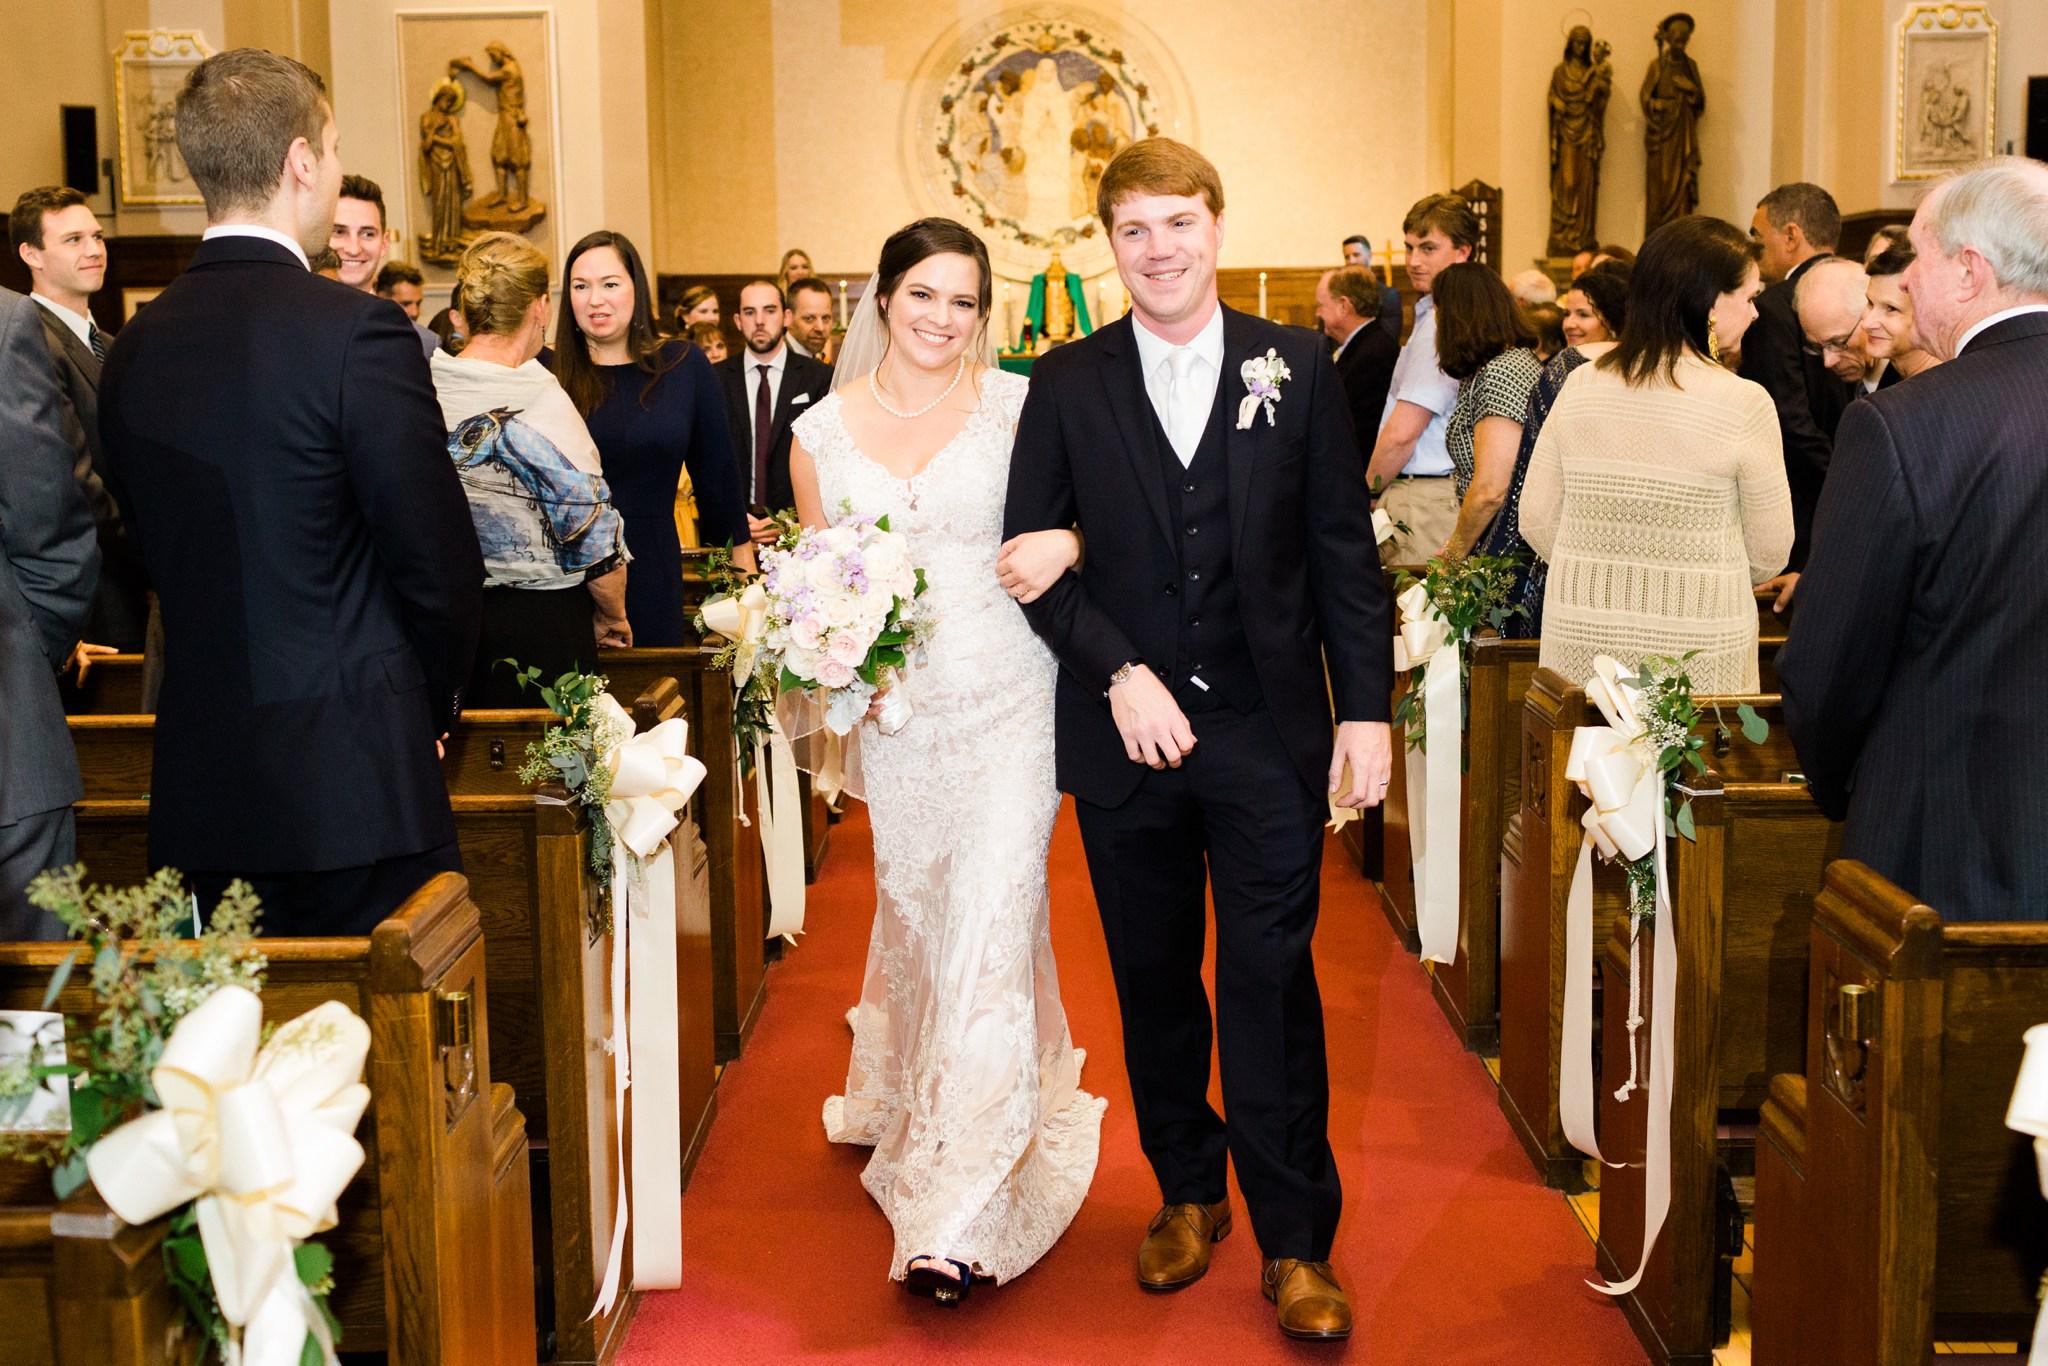 Fall_new_england_wedding_photos_00019.JPG